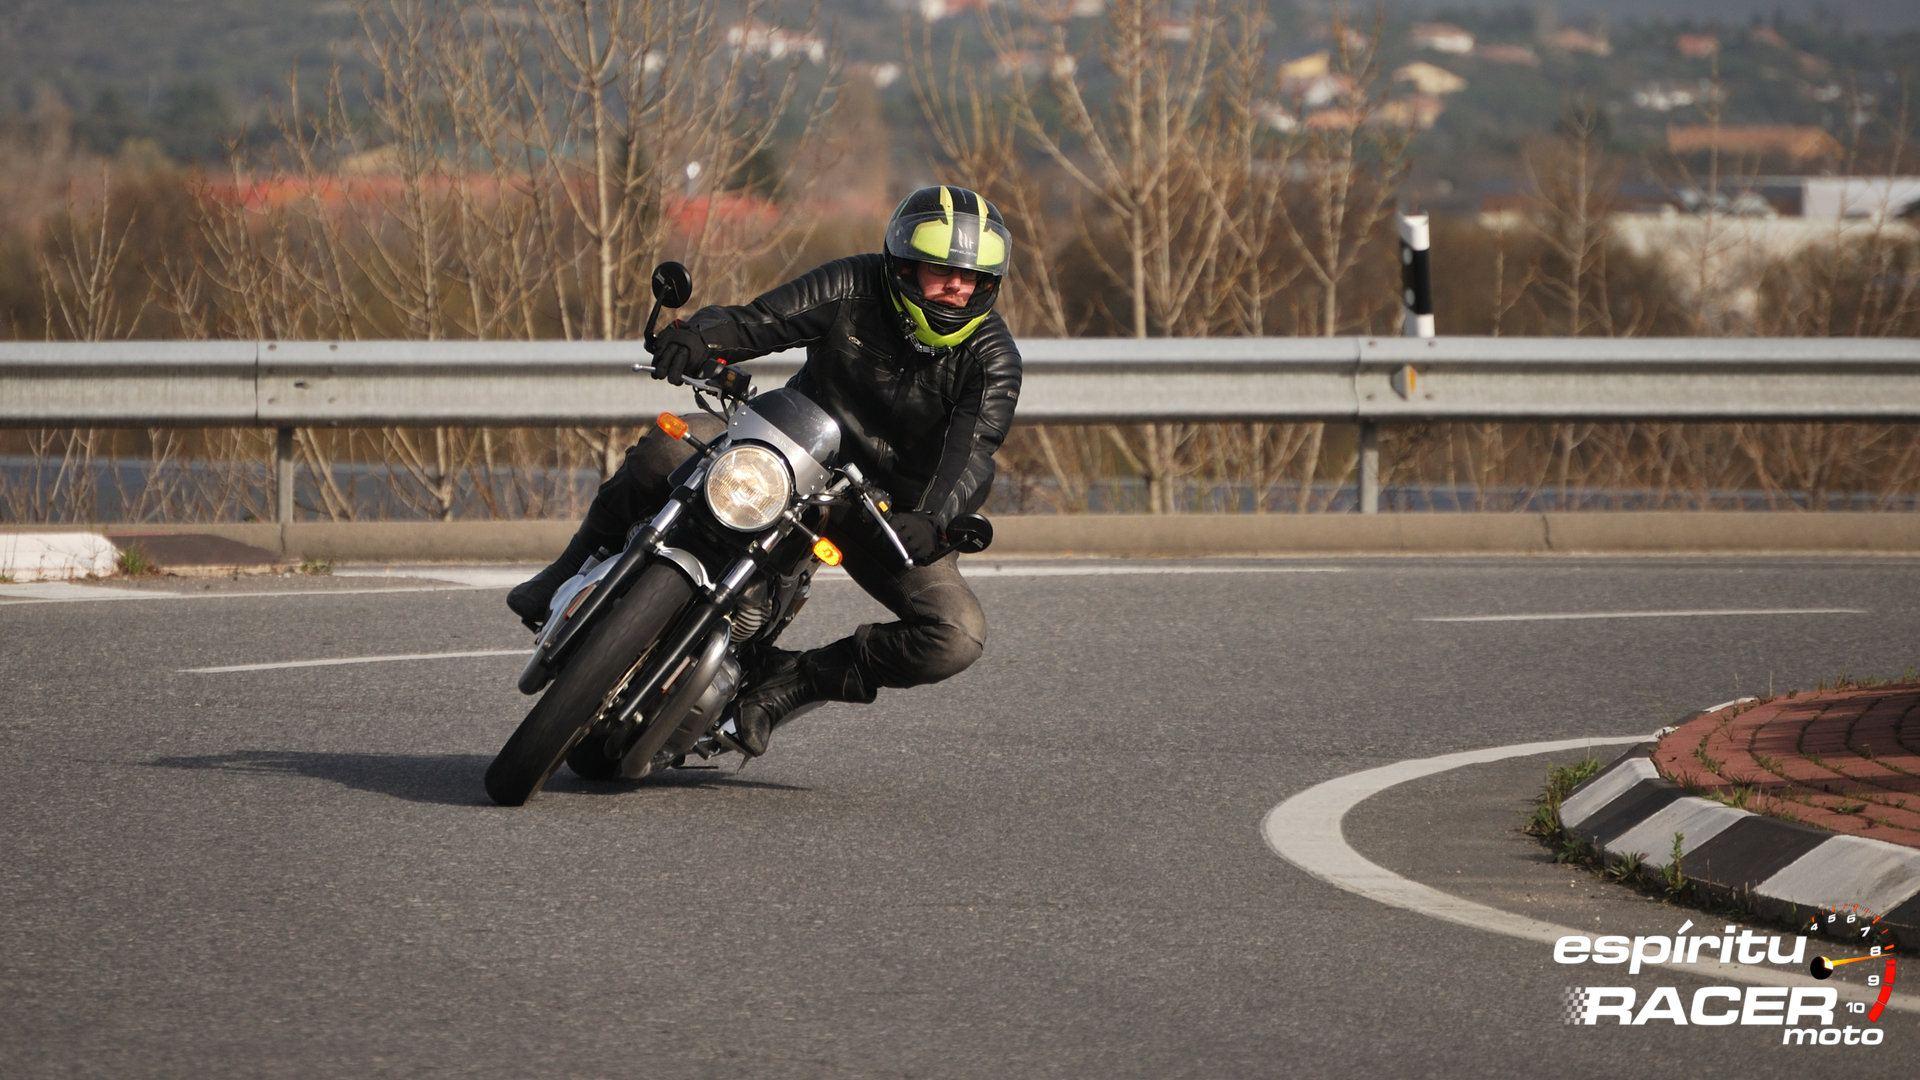 espíritu RACER moto cumple tres años